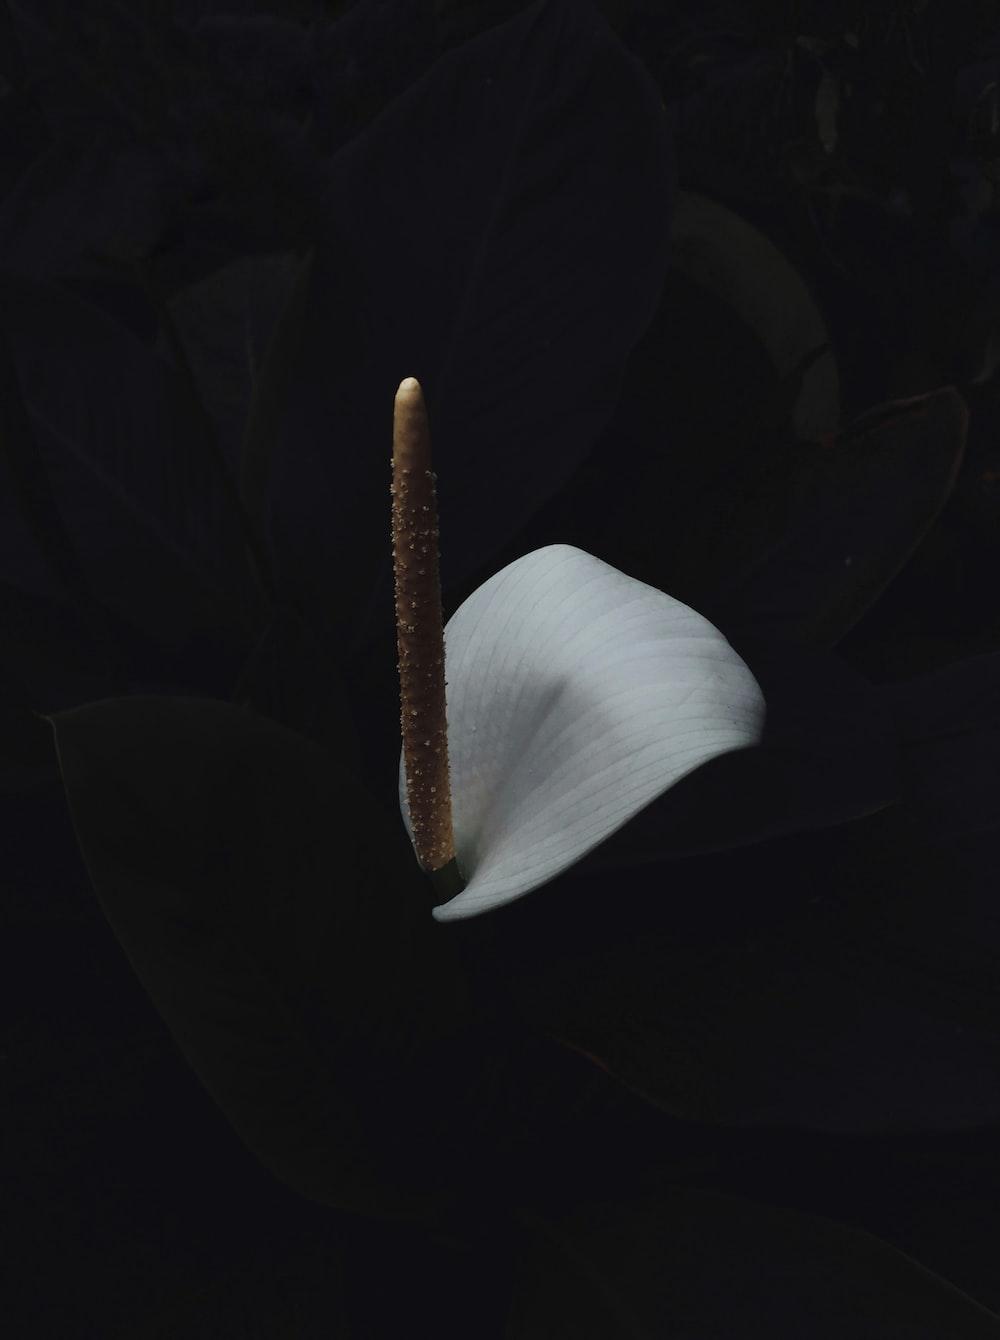 white anthurium with black background